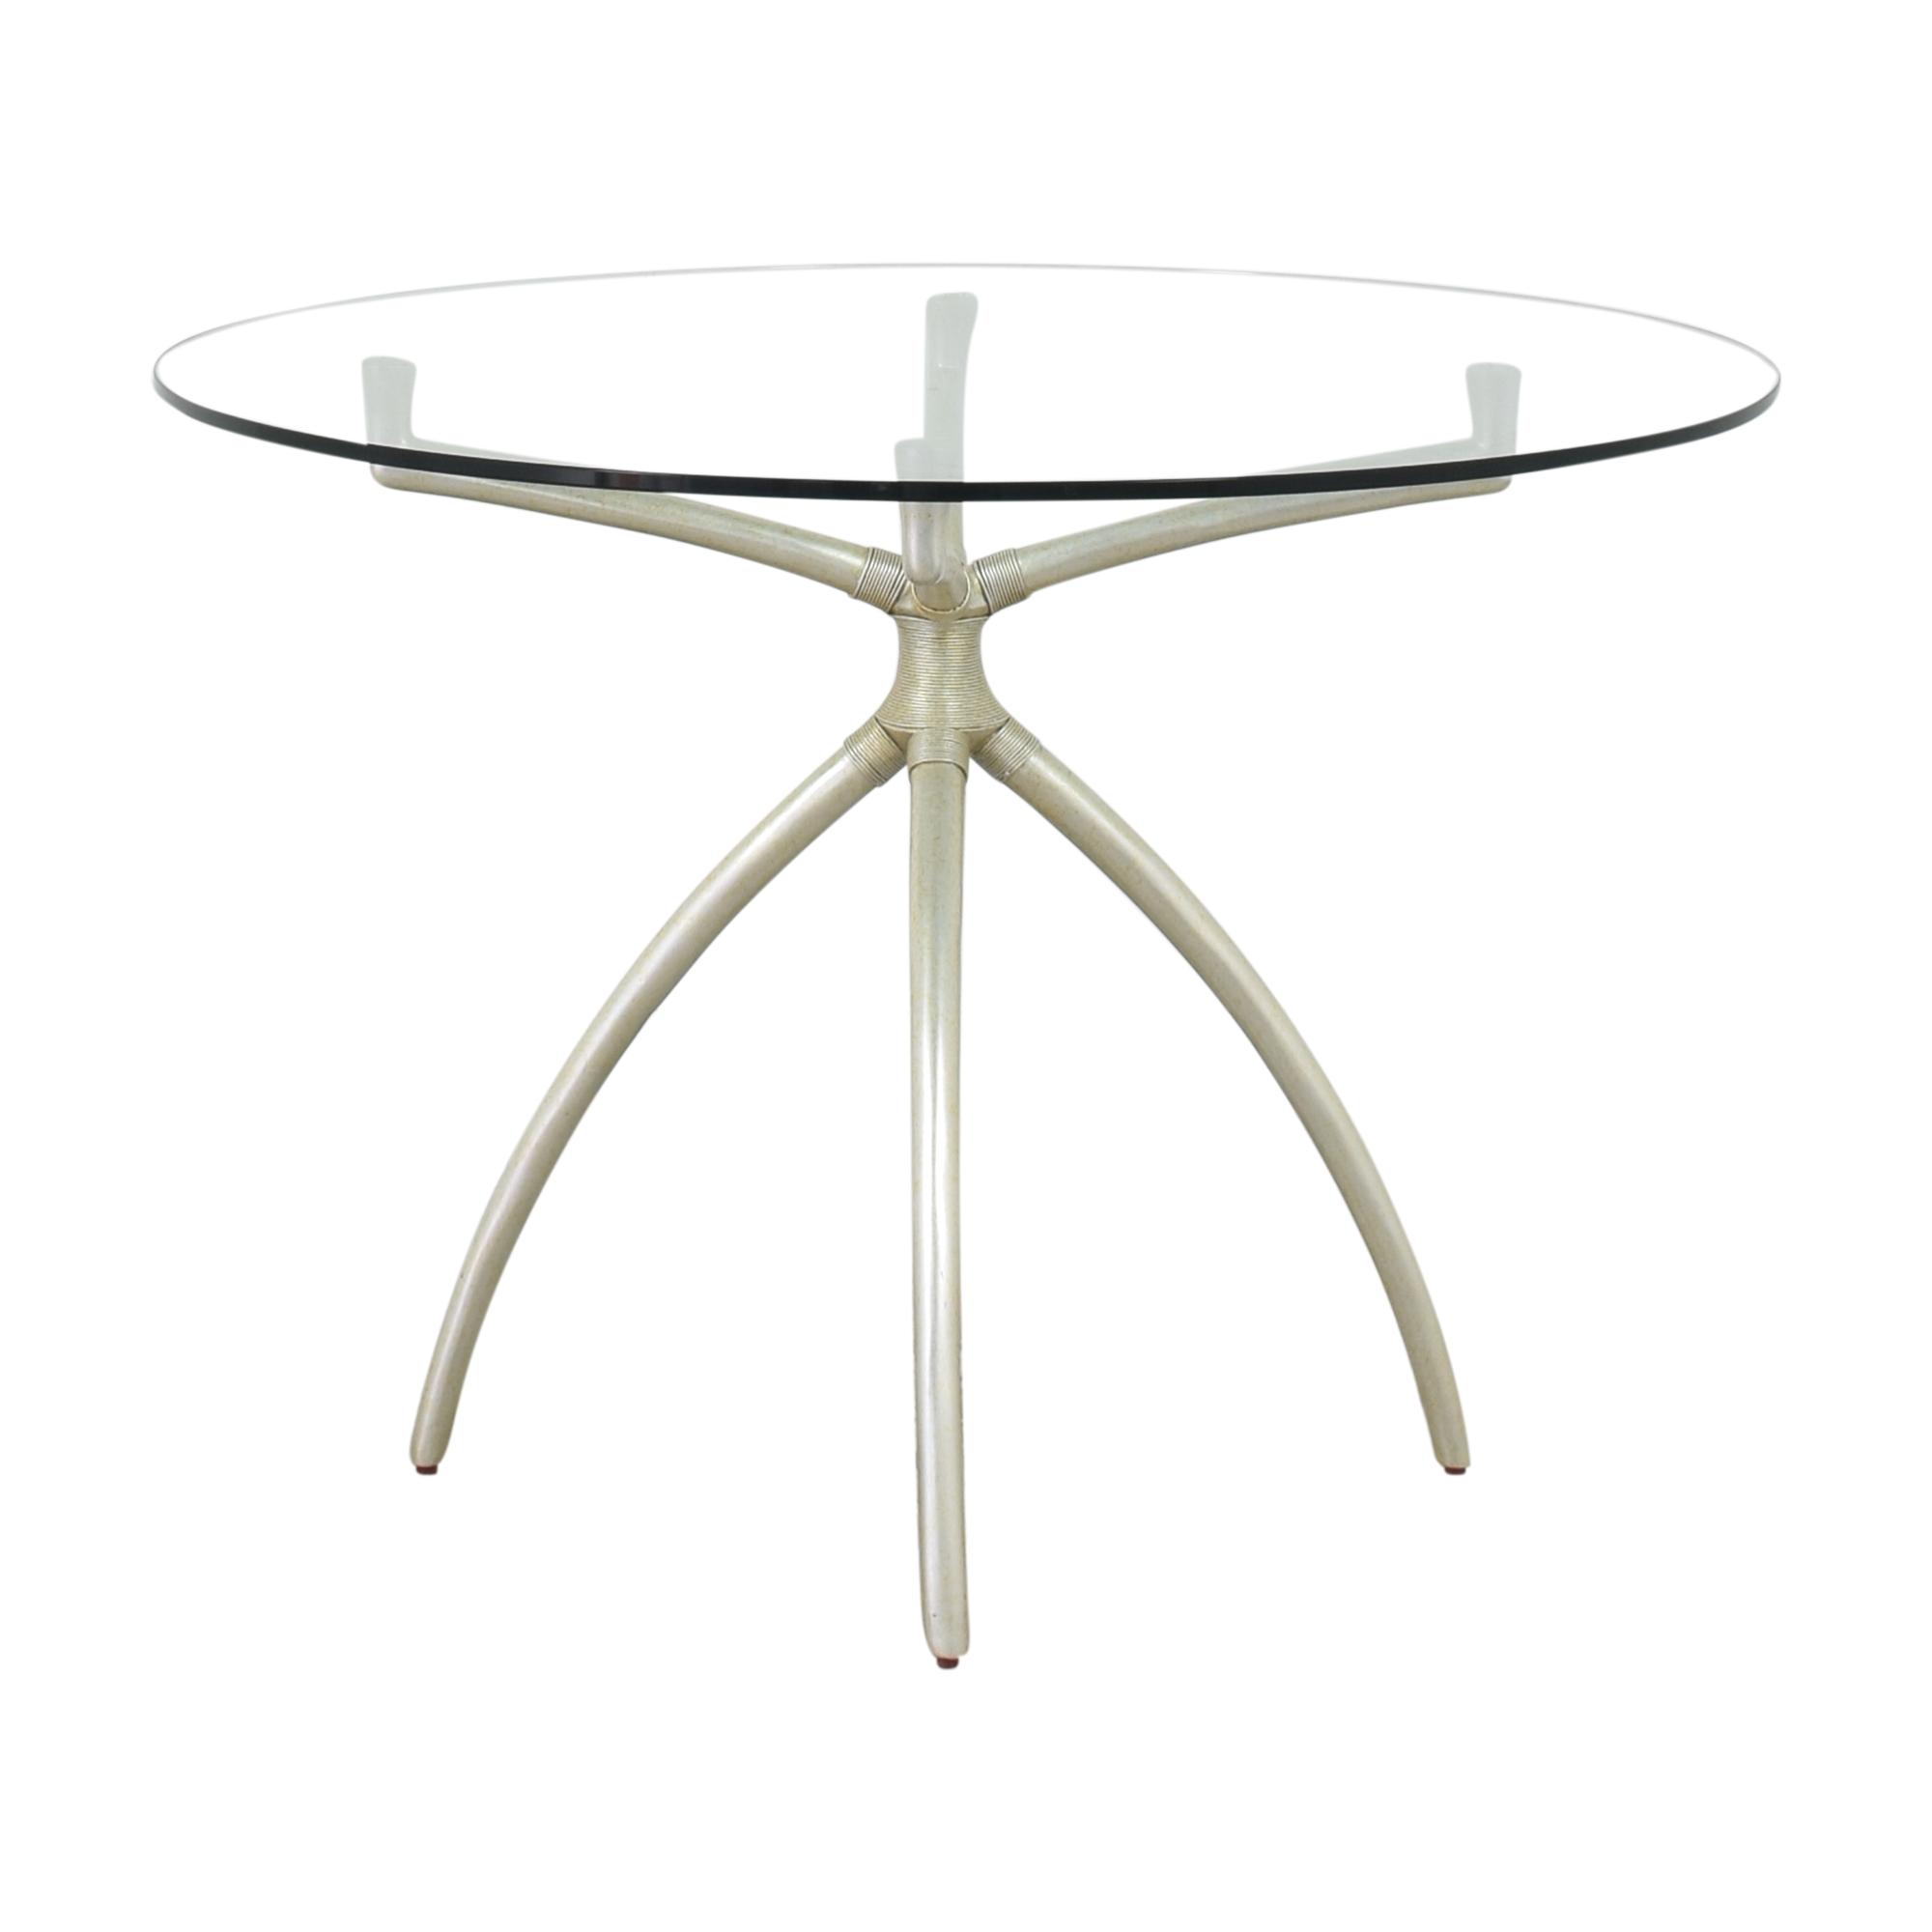 Stanley Furniture Stanley Furniture Hovely Pedestal Dining Table silver